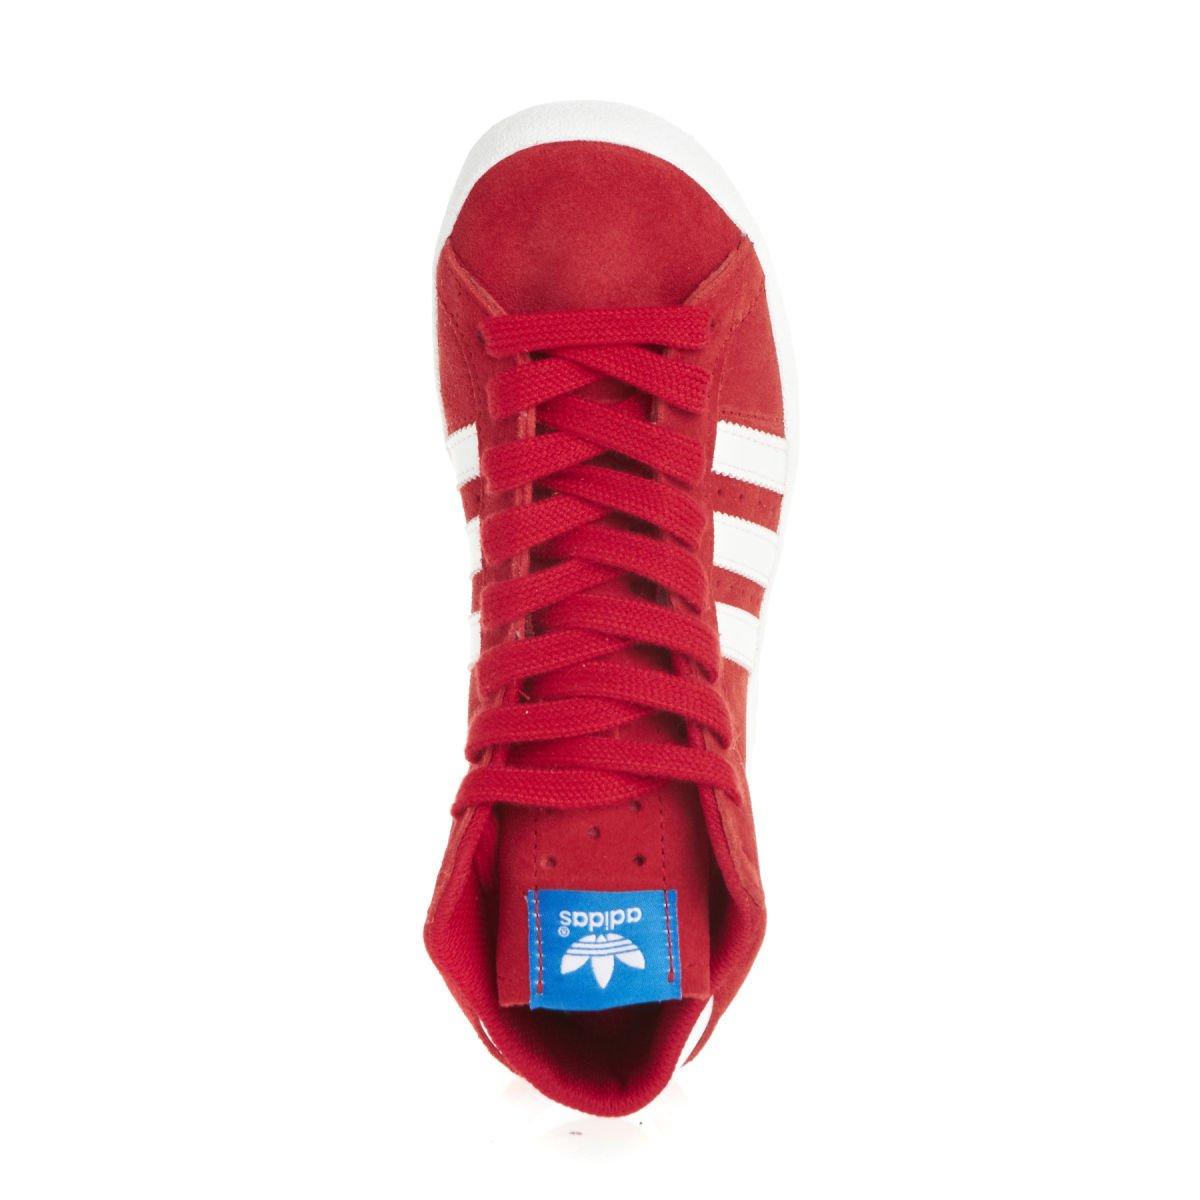 newest 1dbc6 4f94a adidas Basket Profi K, Sneaker Bambini Amazon.it Scarpe e bo